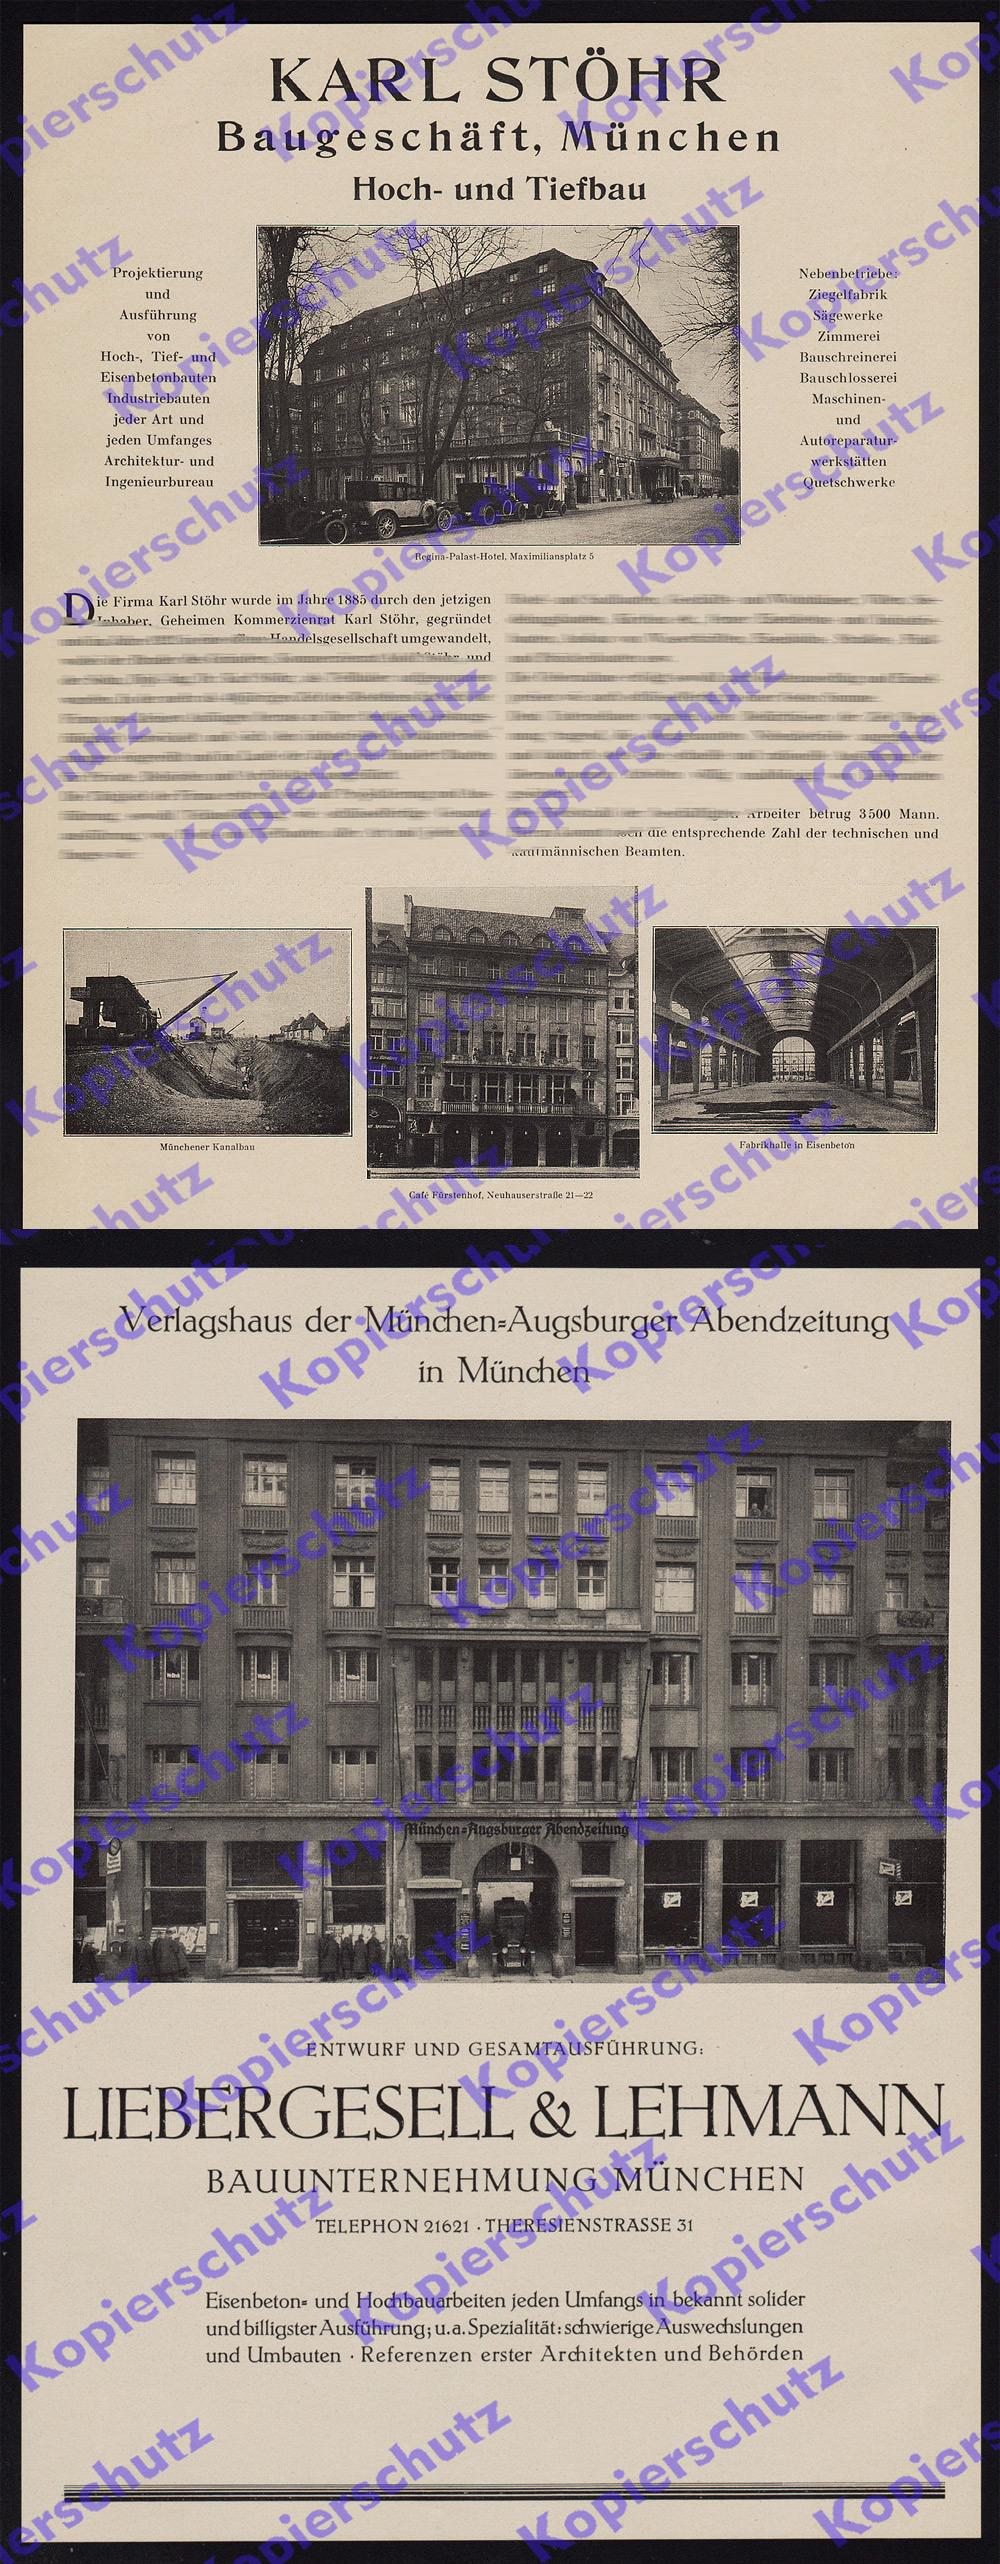 m nchen bauwesen architektur st hr liebergesell stadtgeschichte jugendstil 1927 ebay. Black Bedroom Furniture Sets. Home Design Ideas